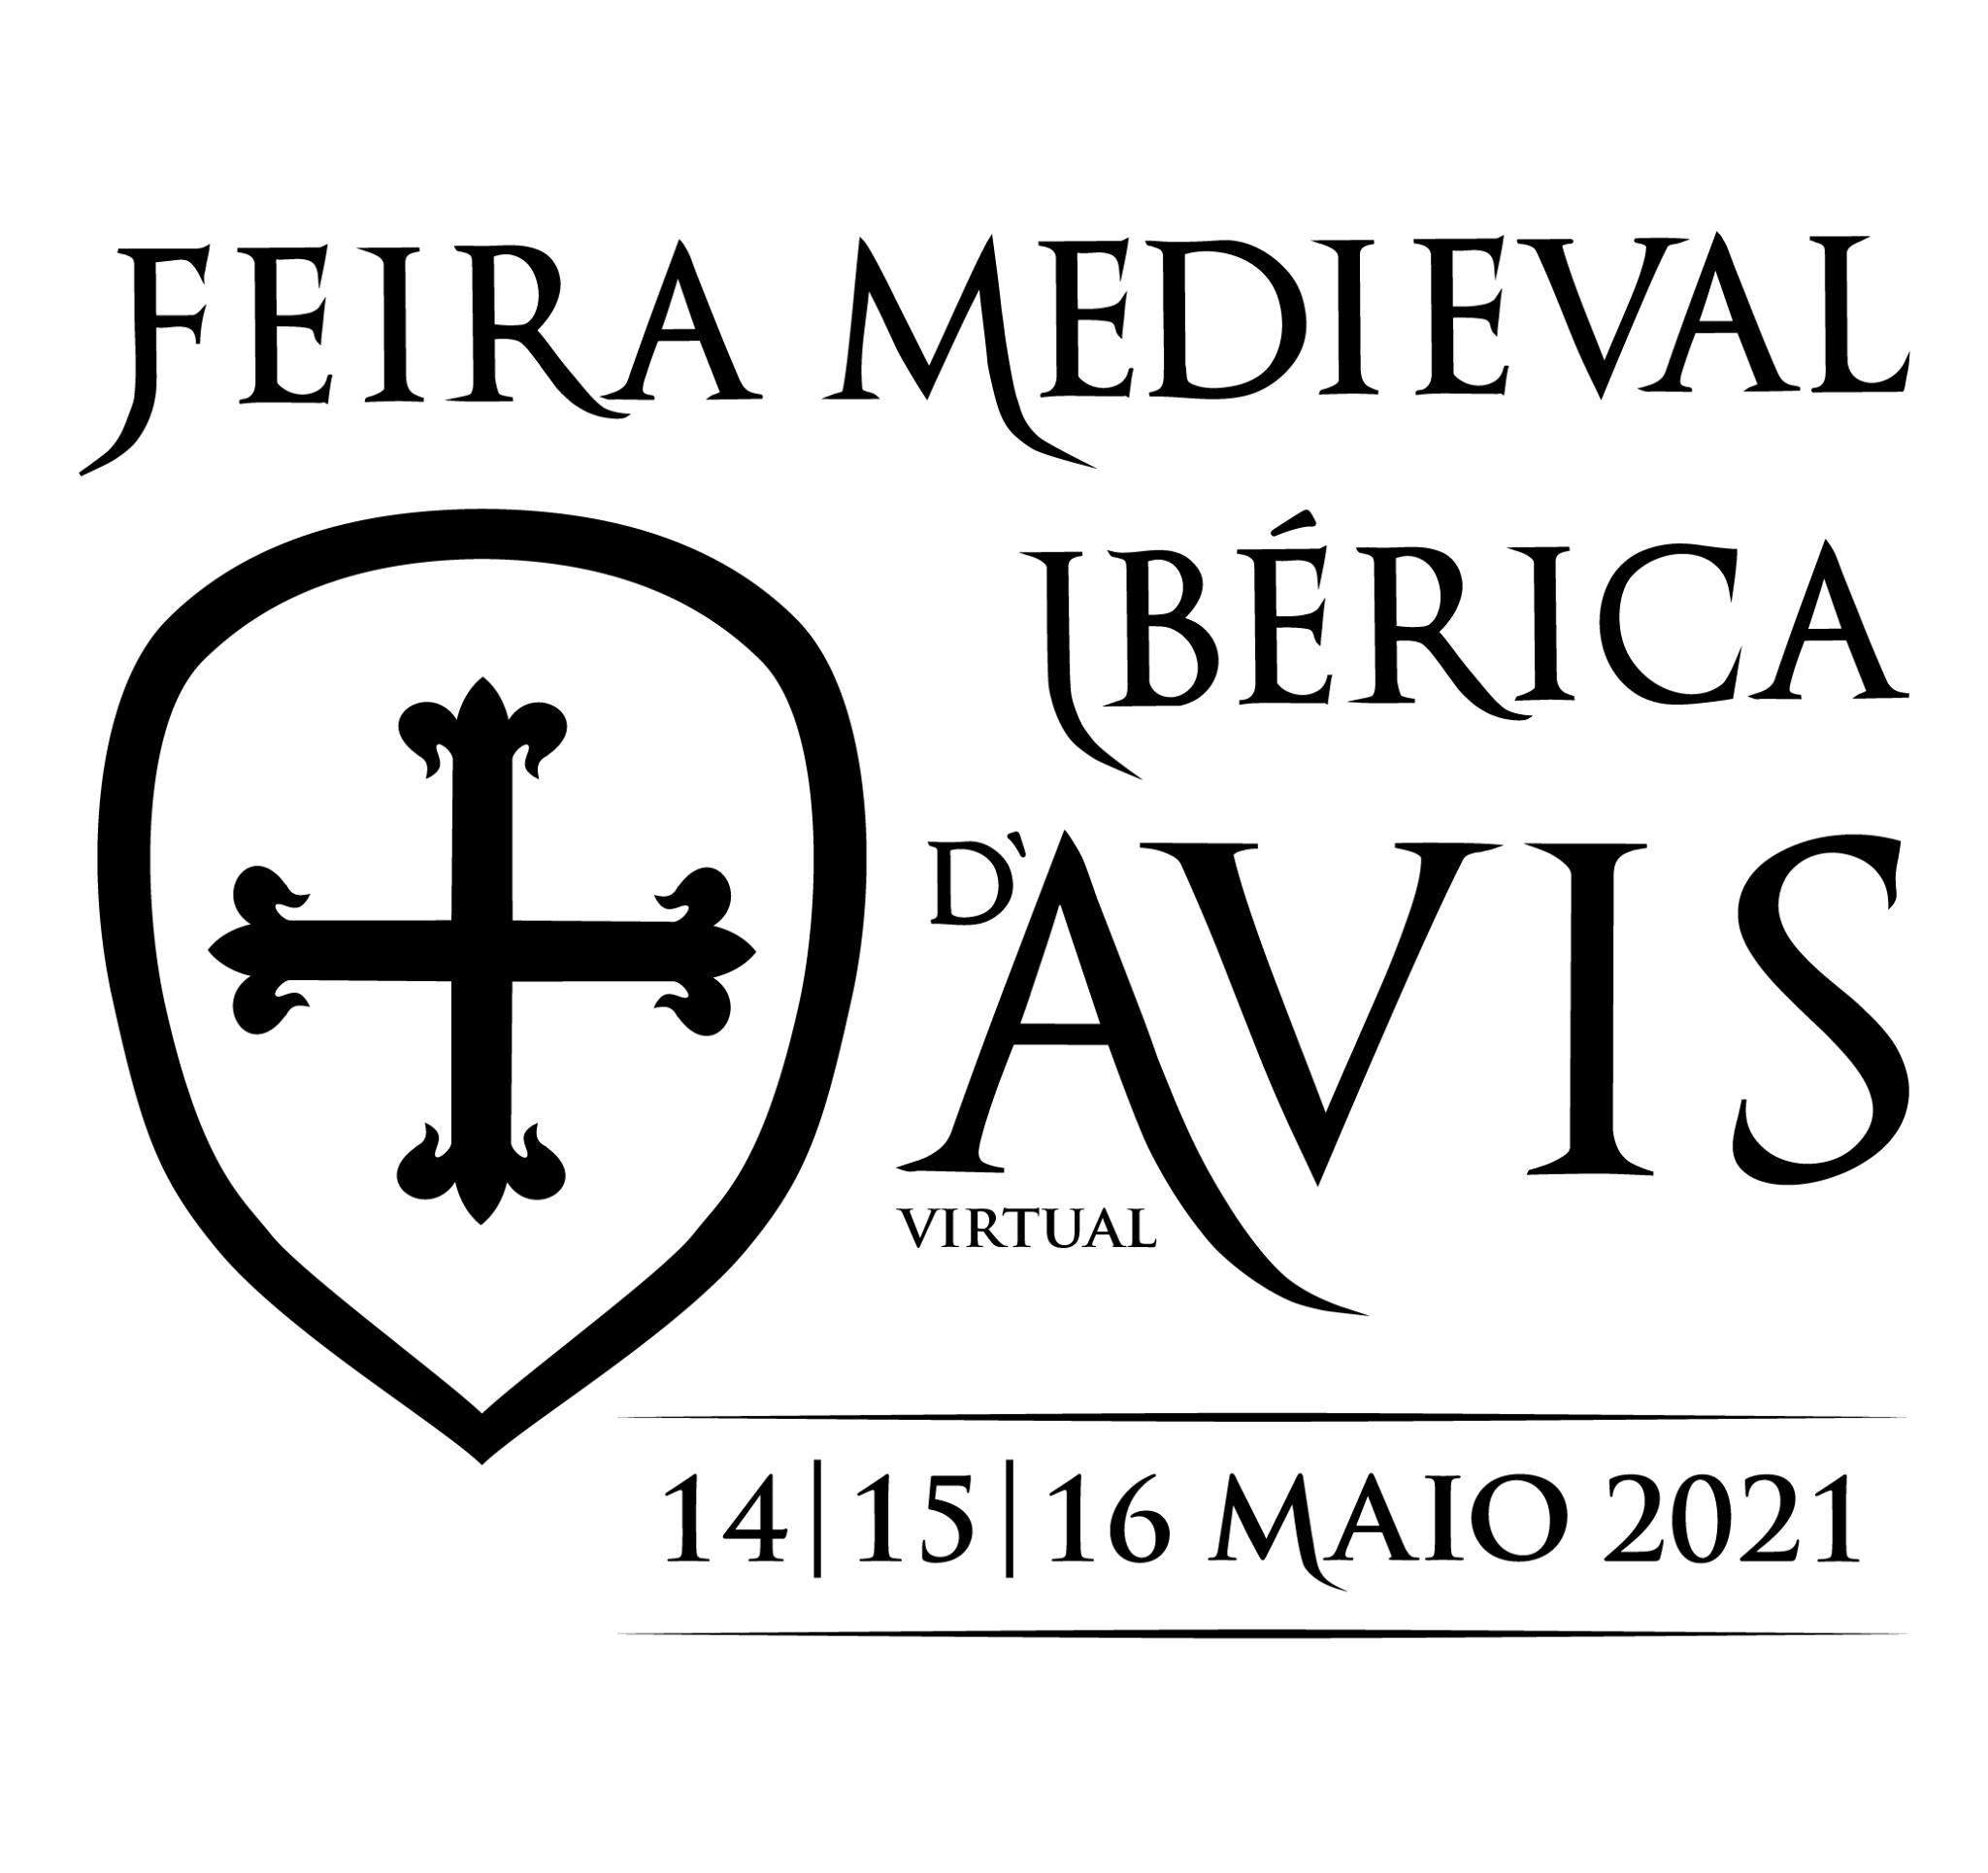 Feira Medieval Ibérica de Avis (virtual)